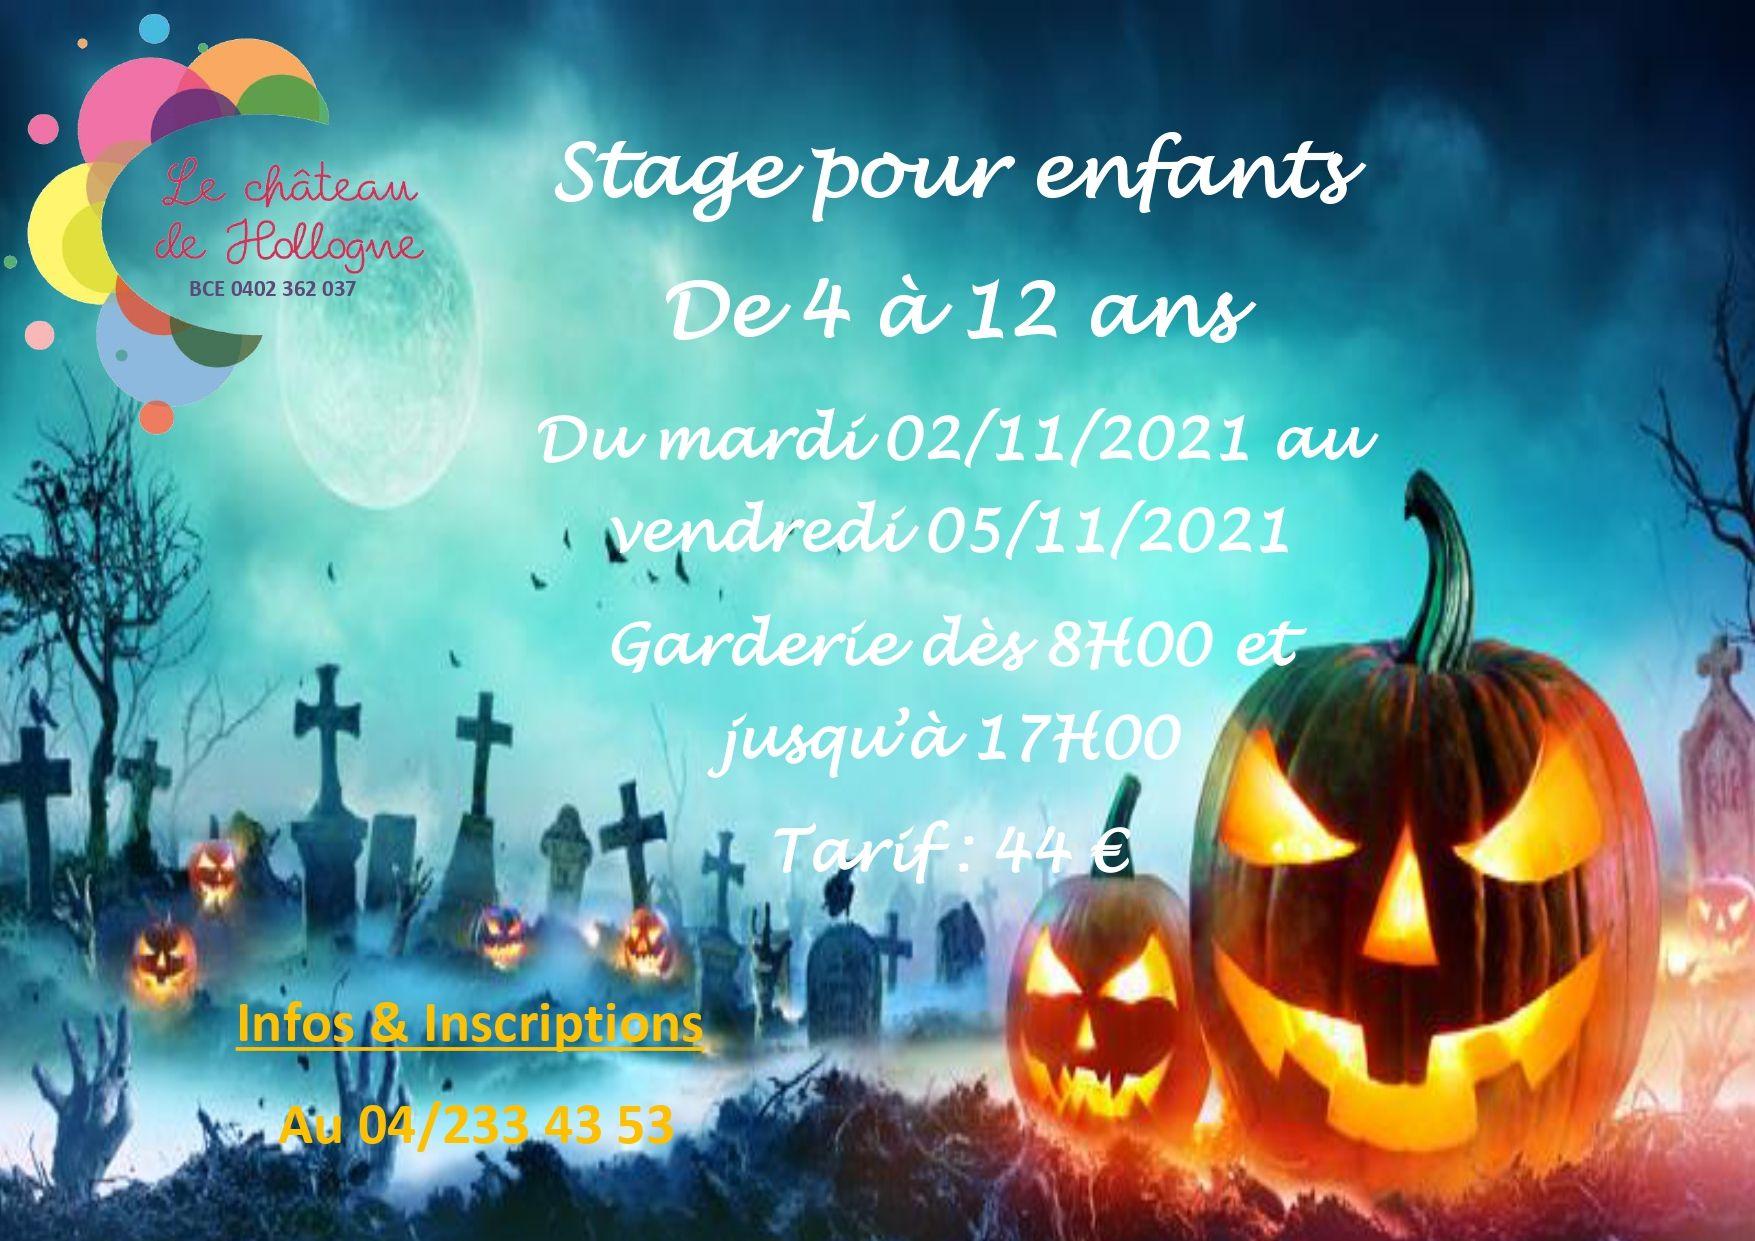 Prospectus Halloween 2021_page-0001 (1).jpg